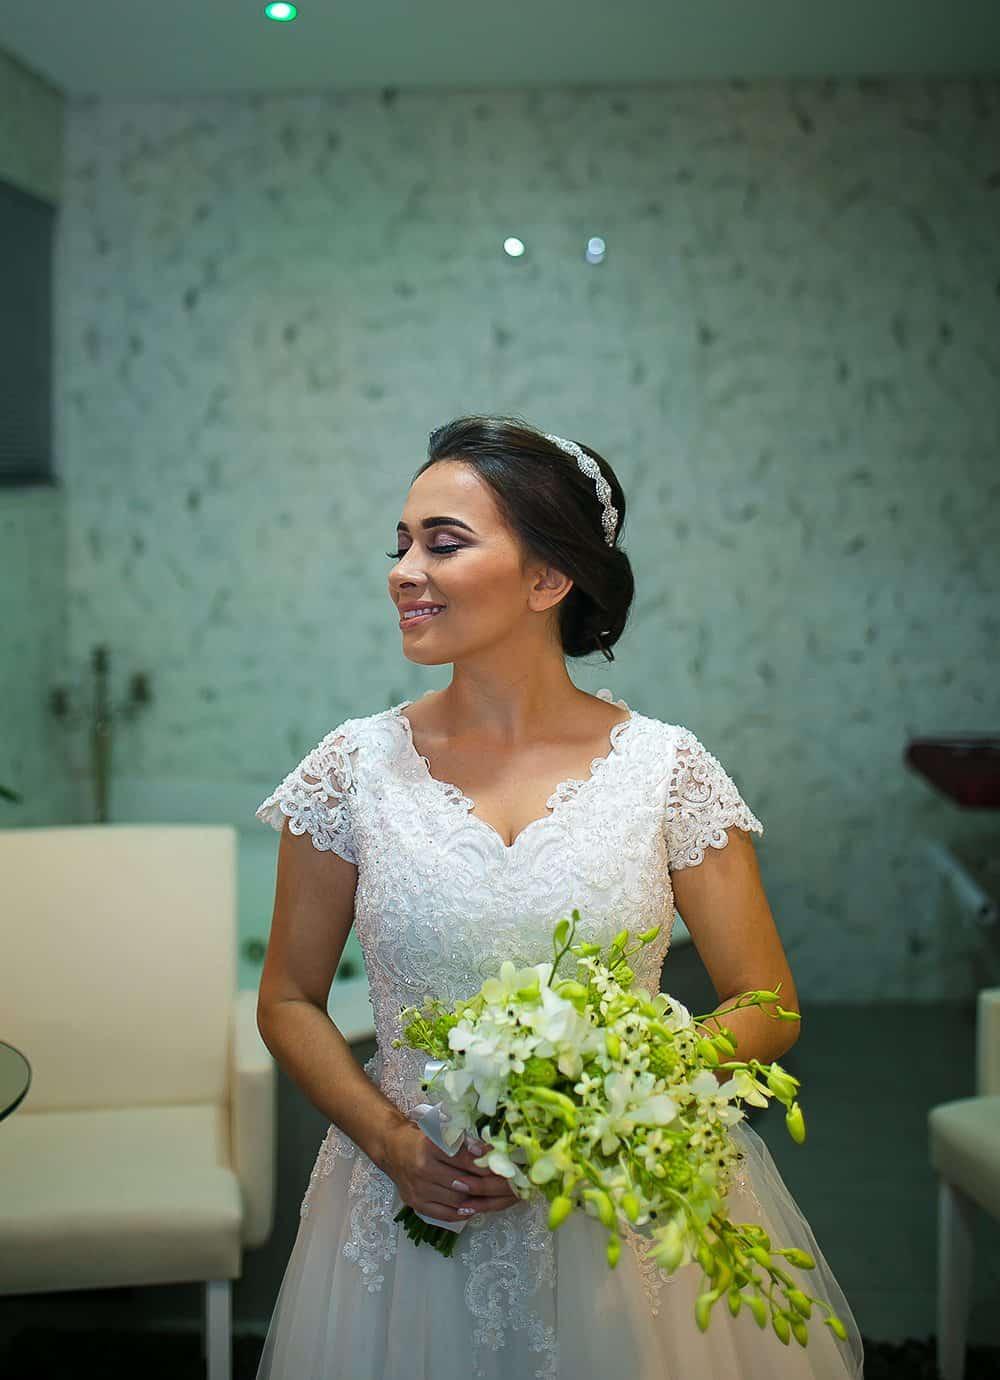 Casamento-Ariana-e-Renato-caseme-48